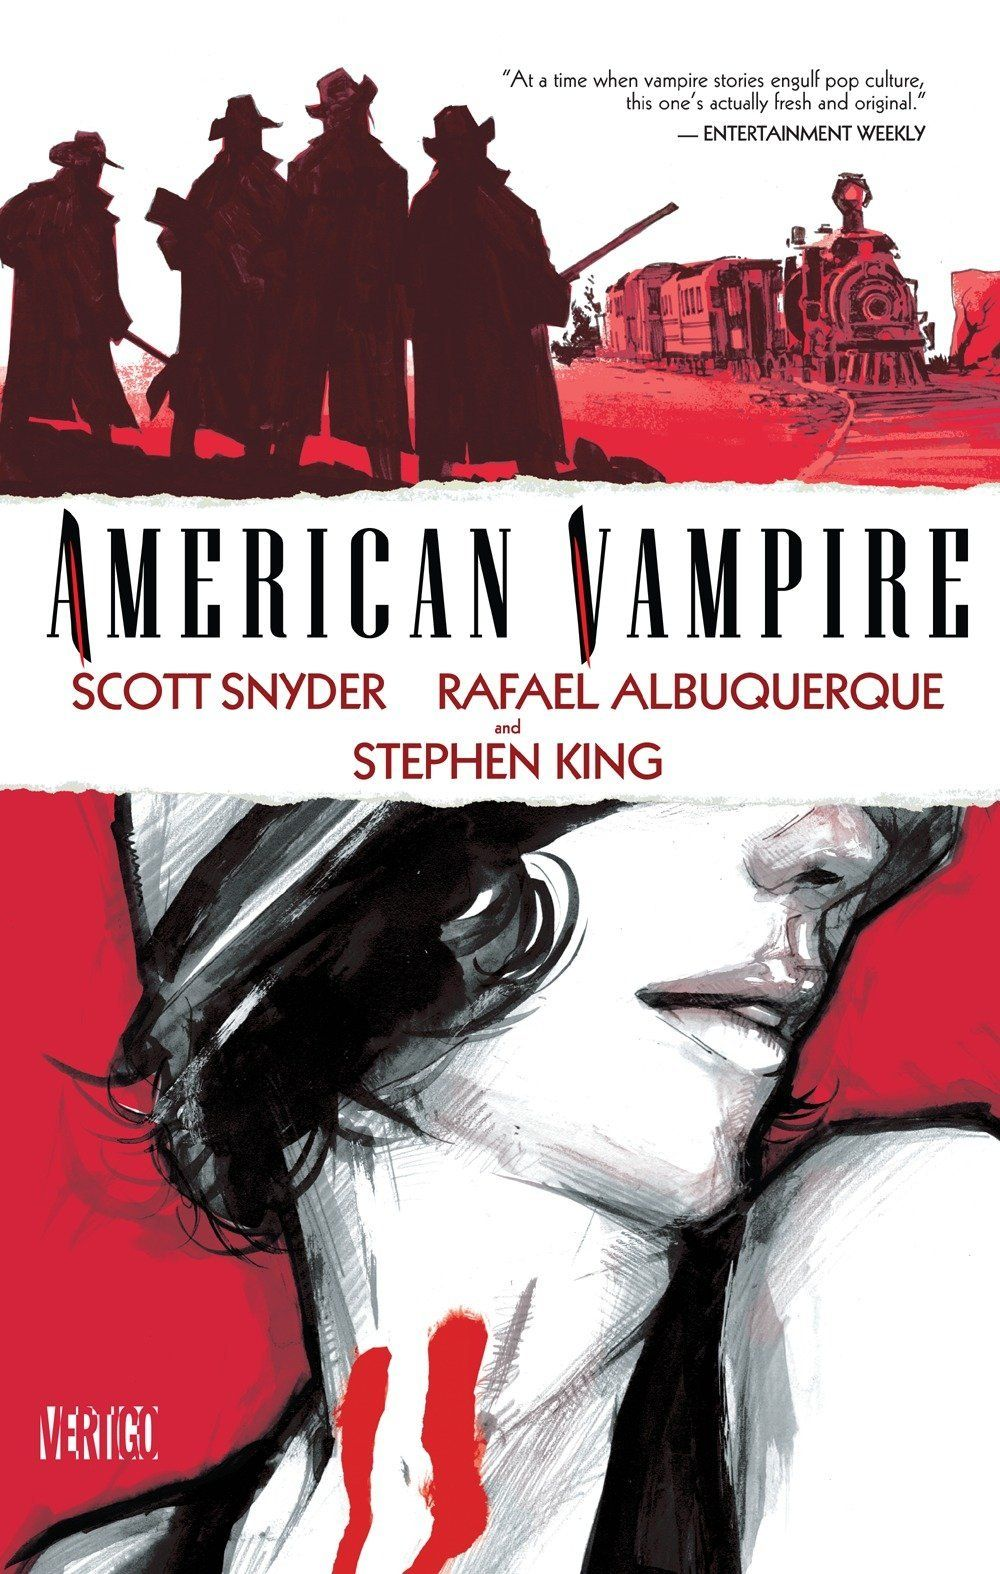 stephen king vampire book - american vampire